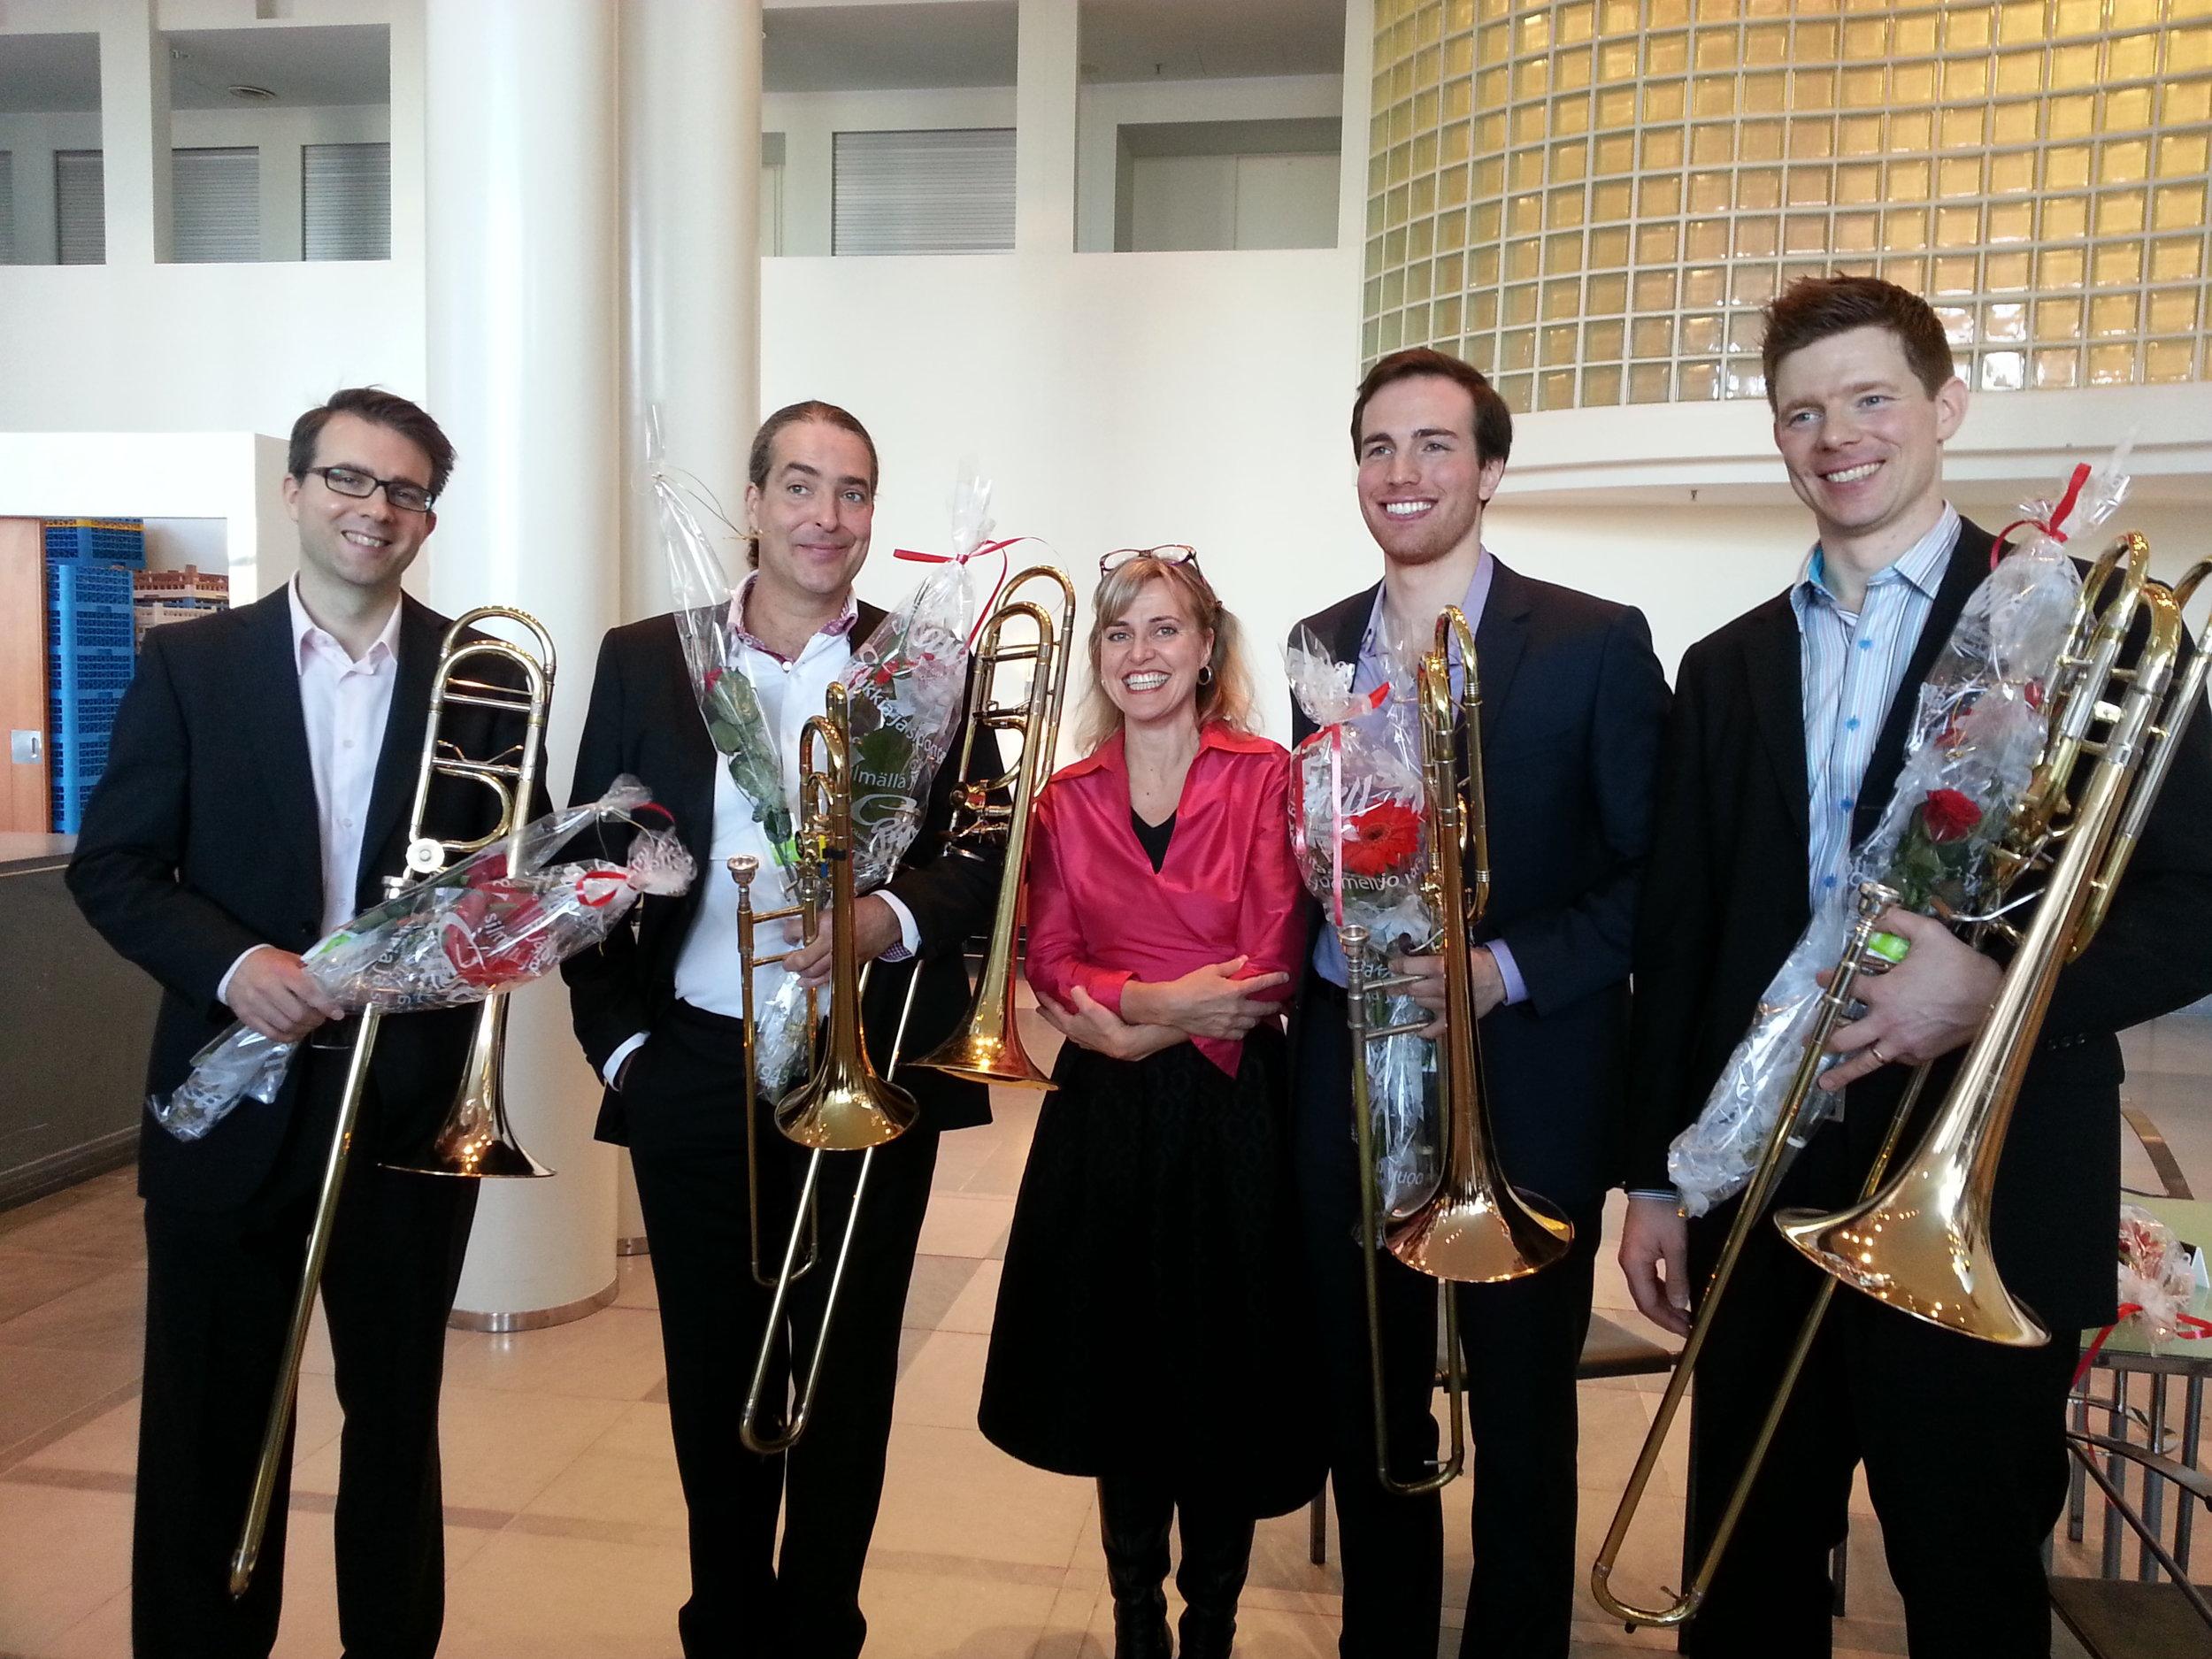 With the trombone section of the Finnish National Opera (John Kotka, Olav Severeide, and Niklas Larsson) and pianist Satu Elijärvi after a quartet recital